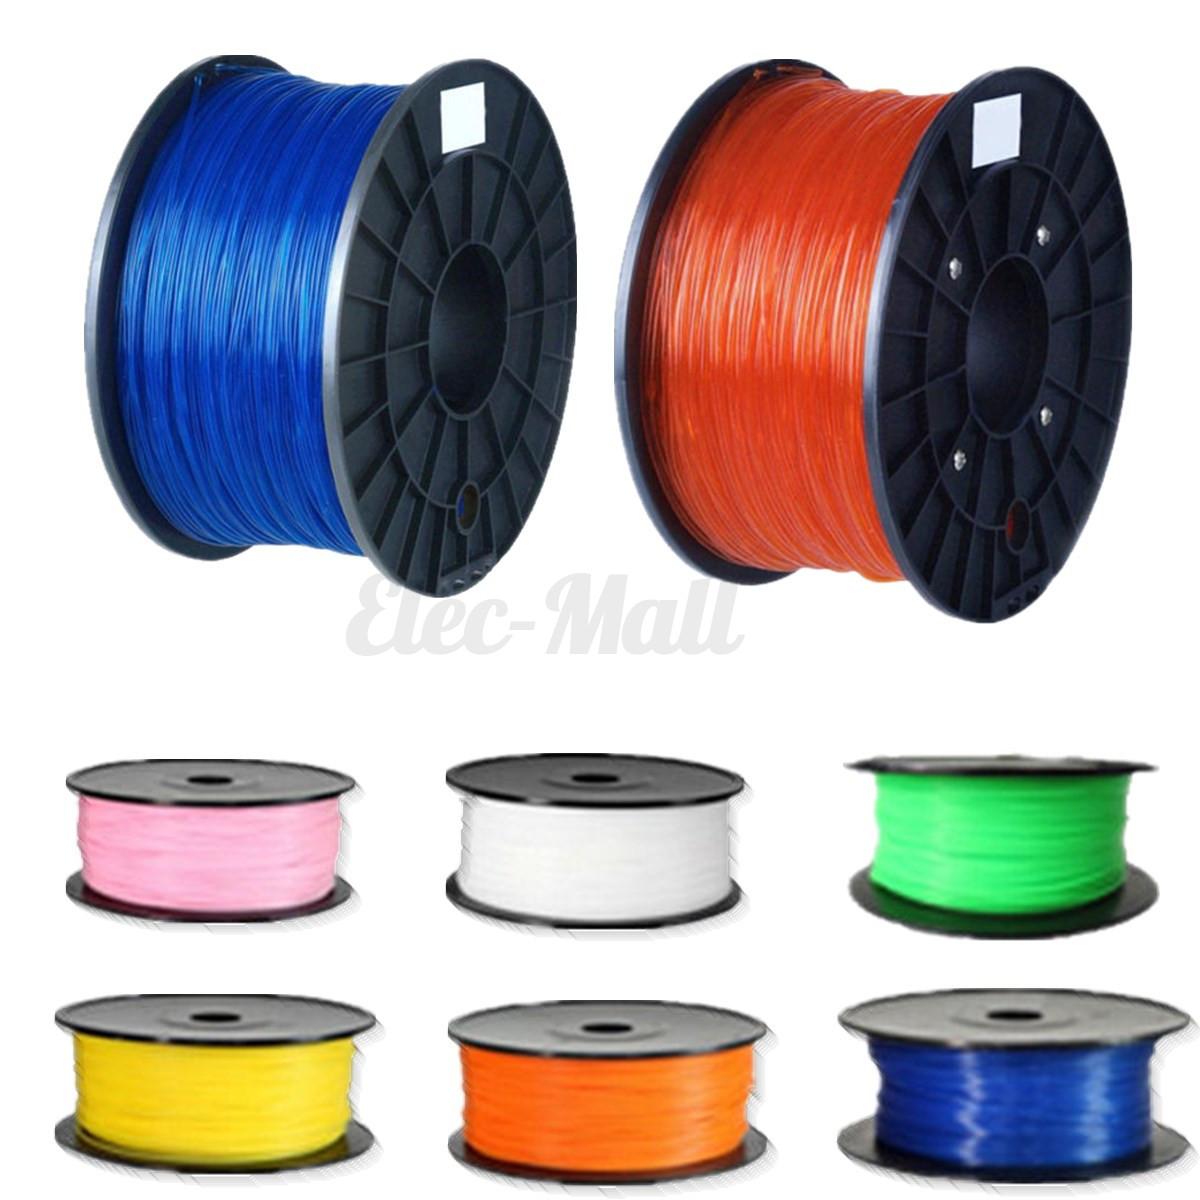 Colors Glow In The Dark 10m 3D Printer Filament 1.75mm PLA